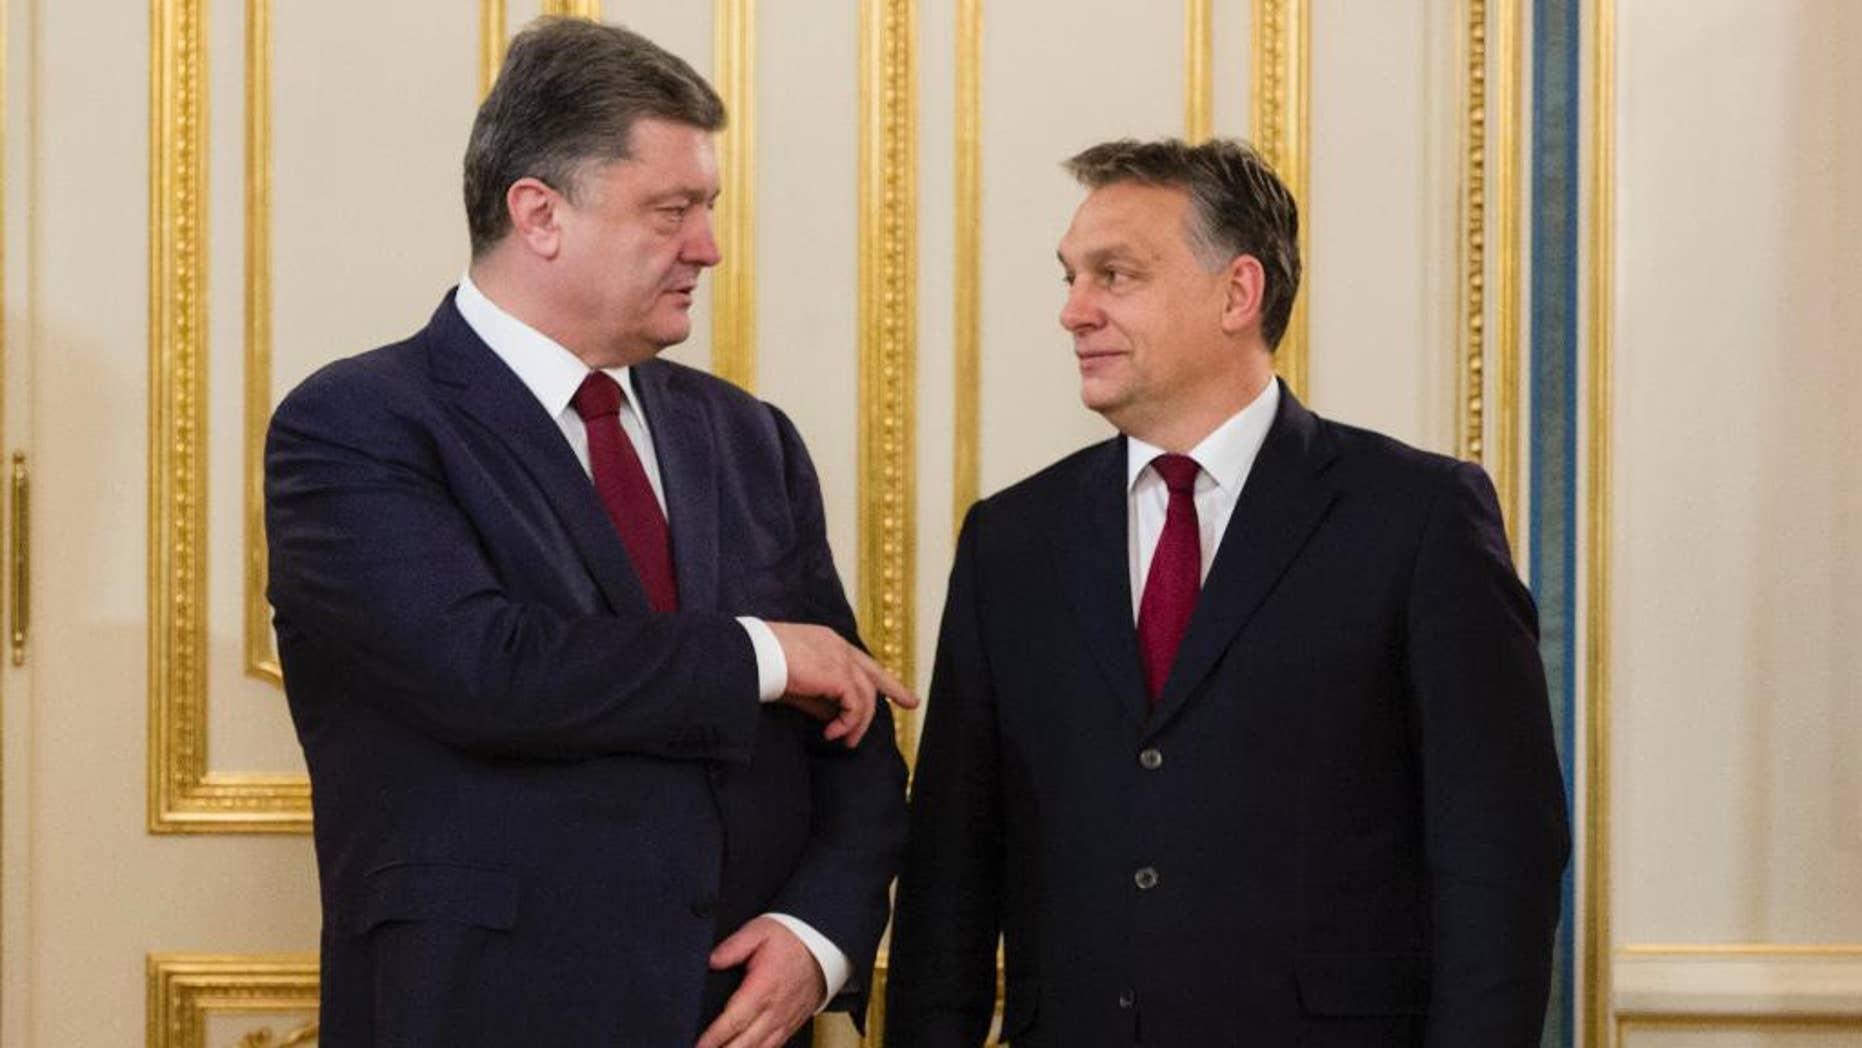 Ukraine's President Petro Poroshenko, left, talks with Hungarian Prime Minister Viktor Orban in Kiev, Ukraine, Friday, Feb. 13, 2015. (AP Photo/Mikhail Palinchak, Pool)